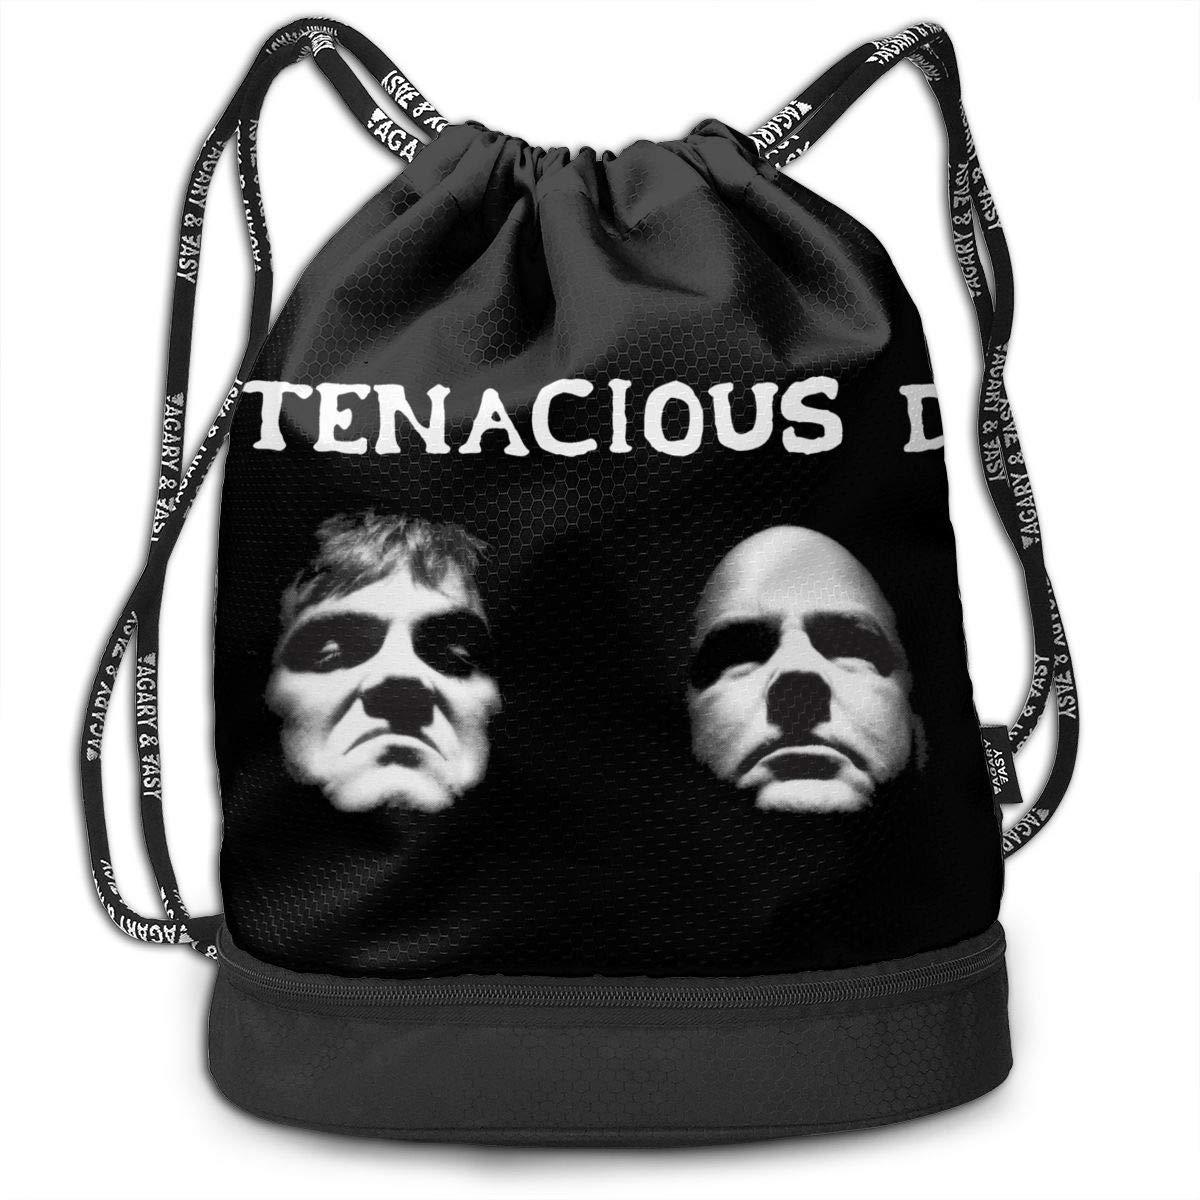 AgoodShop Tenacious D Drawstring Backpack Sport Gym Travel Bag